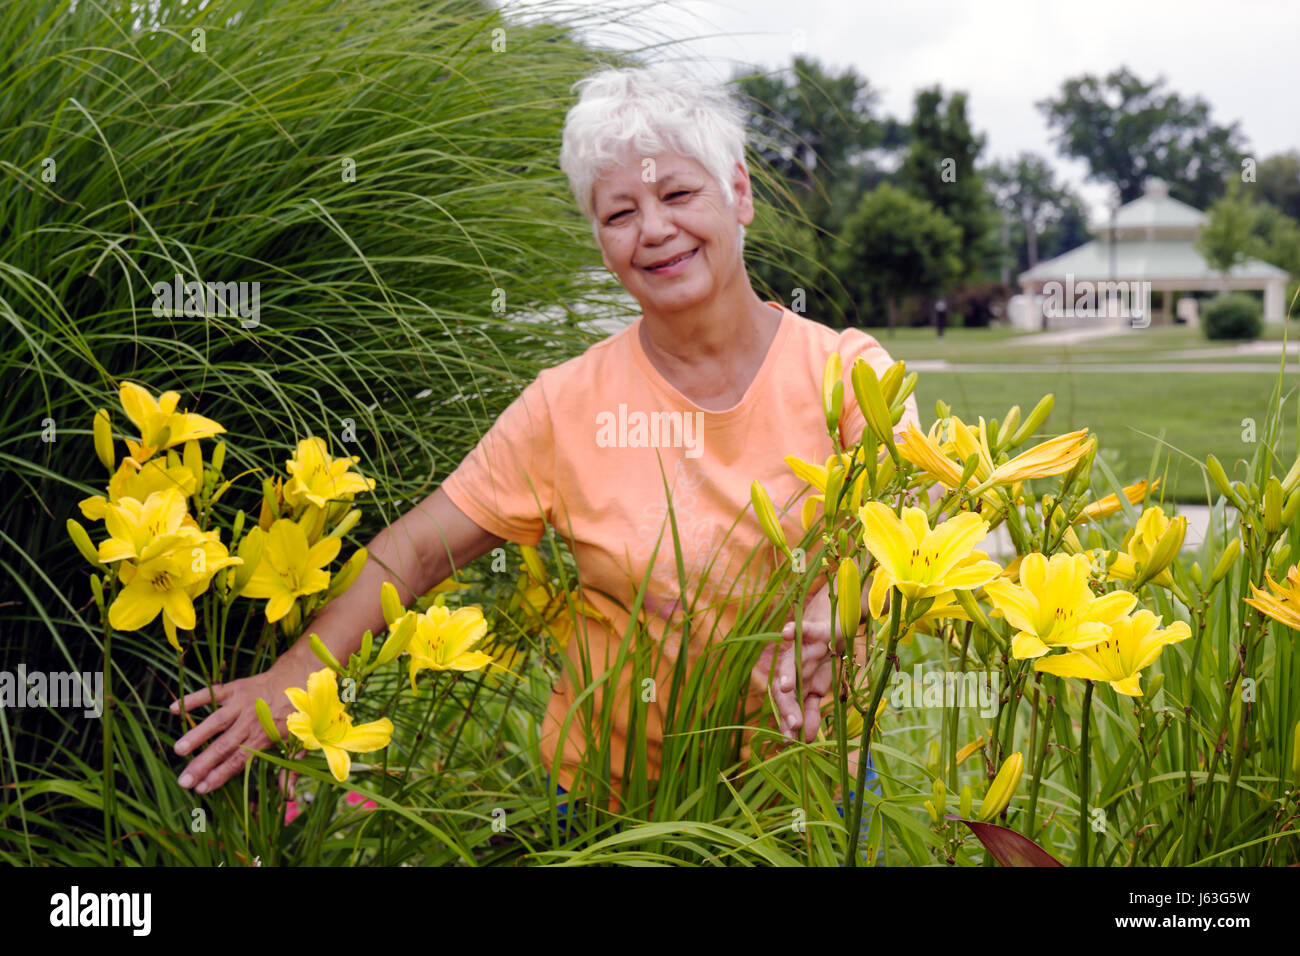 Indiana Portage Gilbert Memorial Park Portage Public Safety Memorial woman yellow lillies flower garden - Stock Image